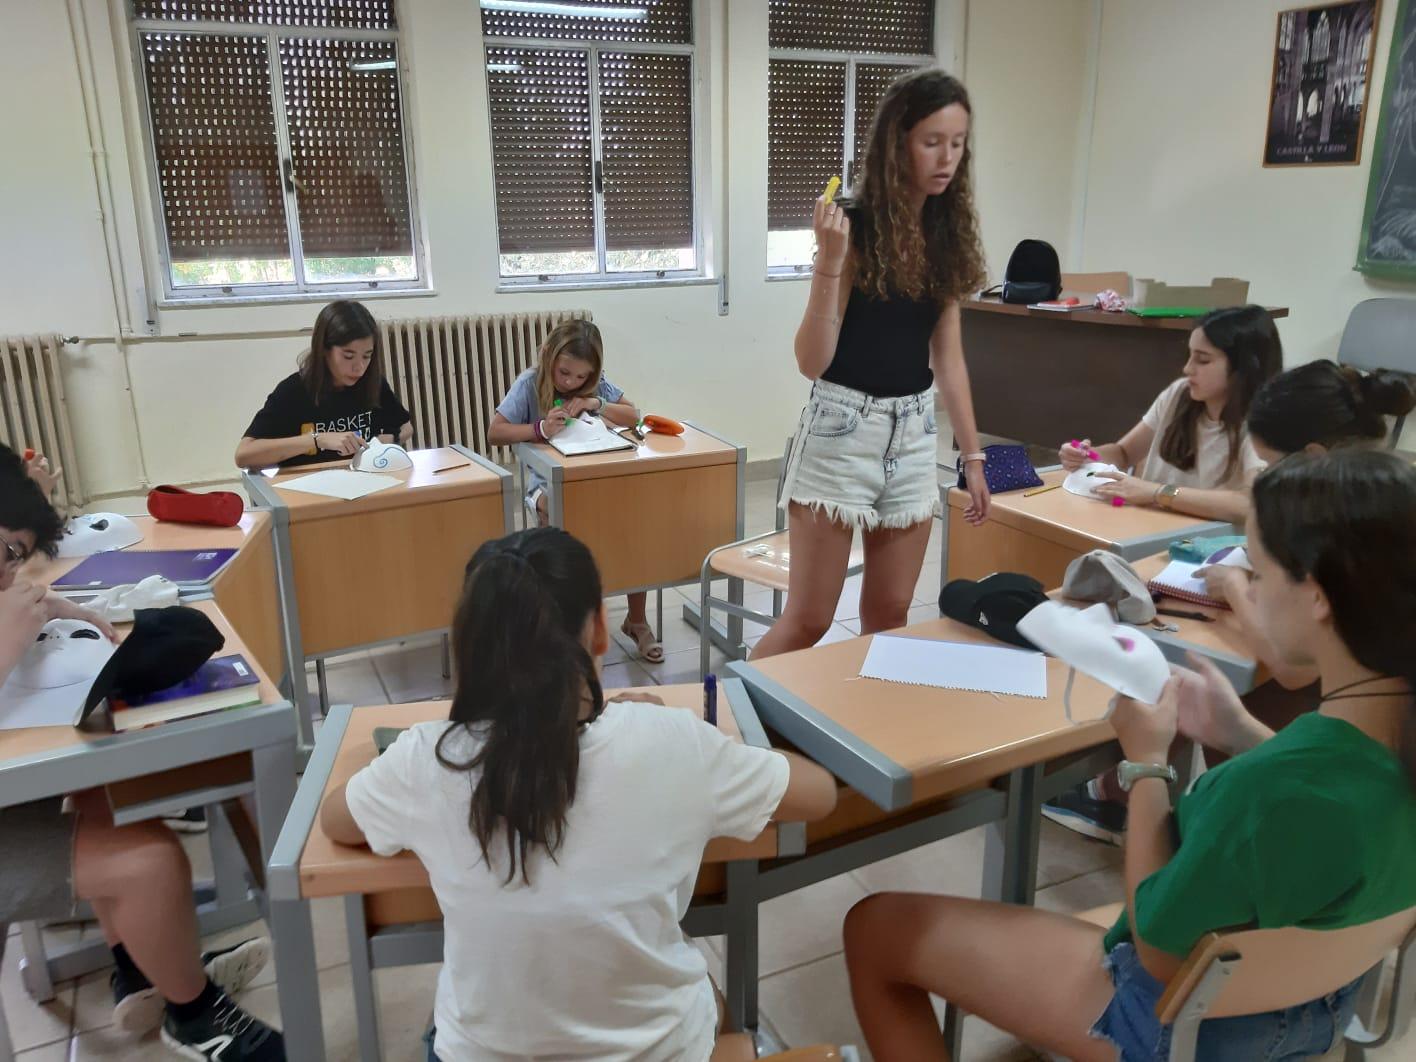 curso intensivo de inglés